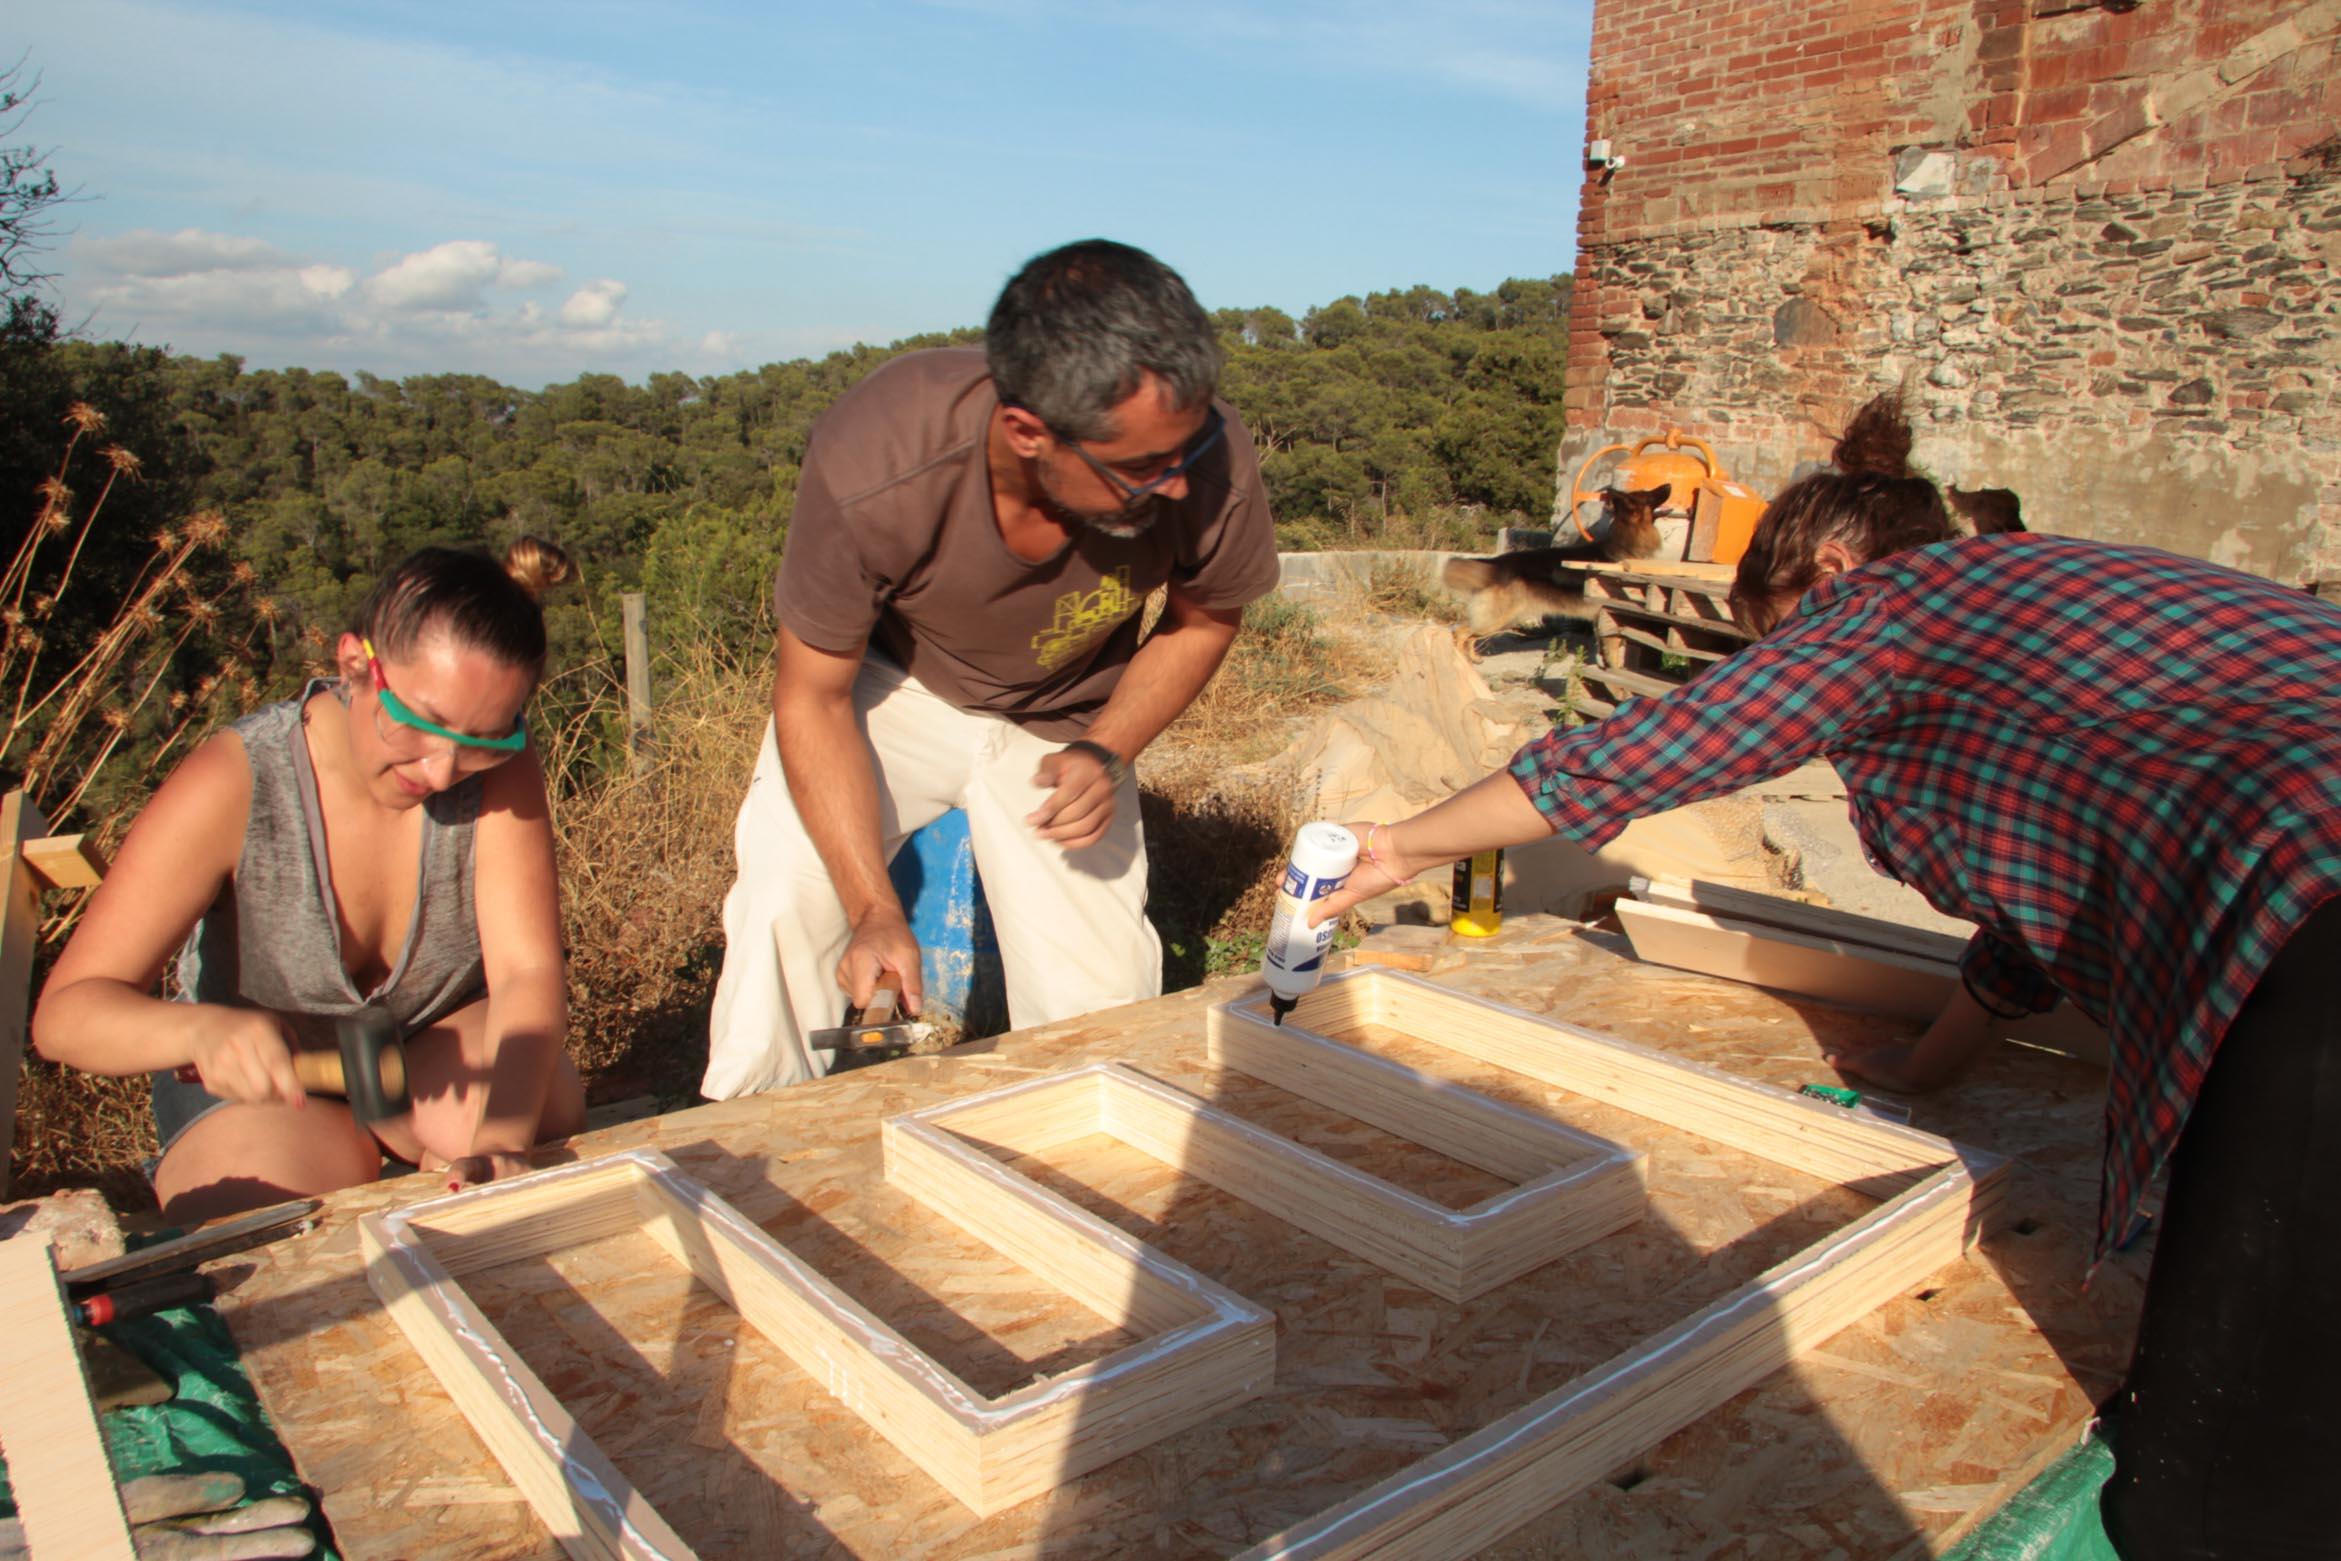 PRODUCCION -ms-balloon-iaac-lo-siento-design-hand-made-wood-work-barcelona_-5